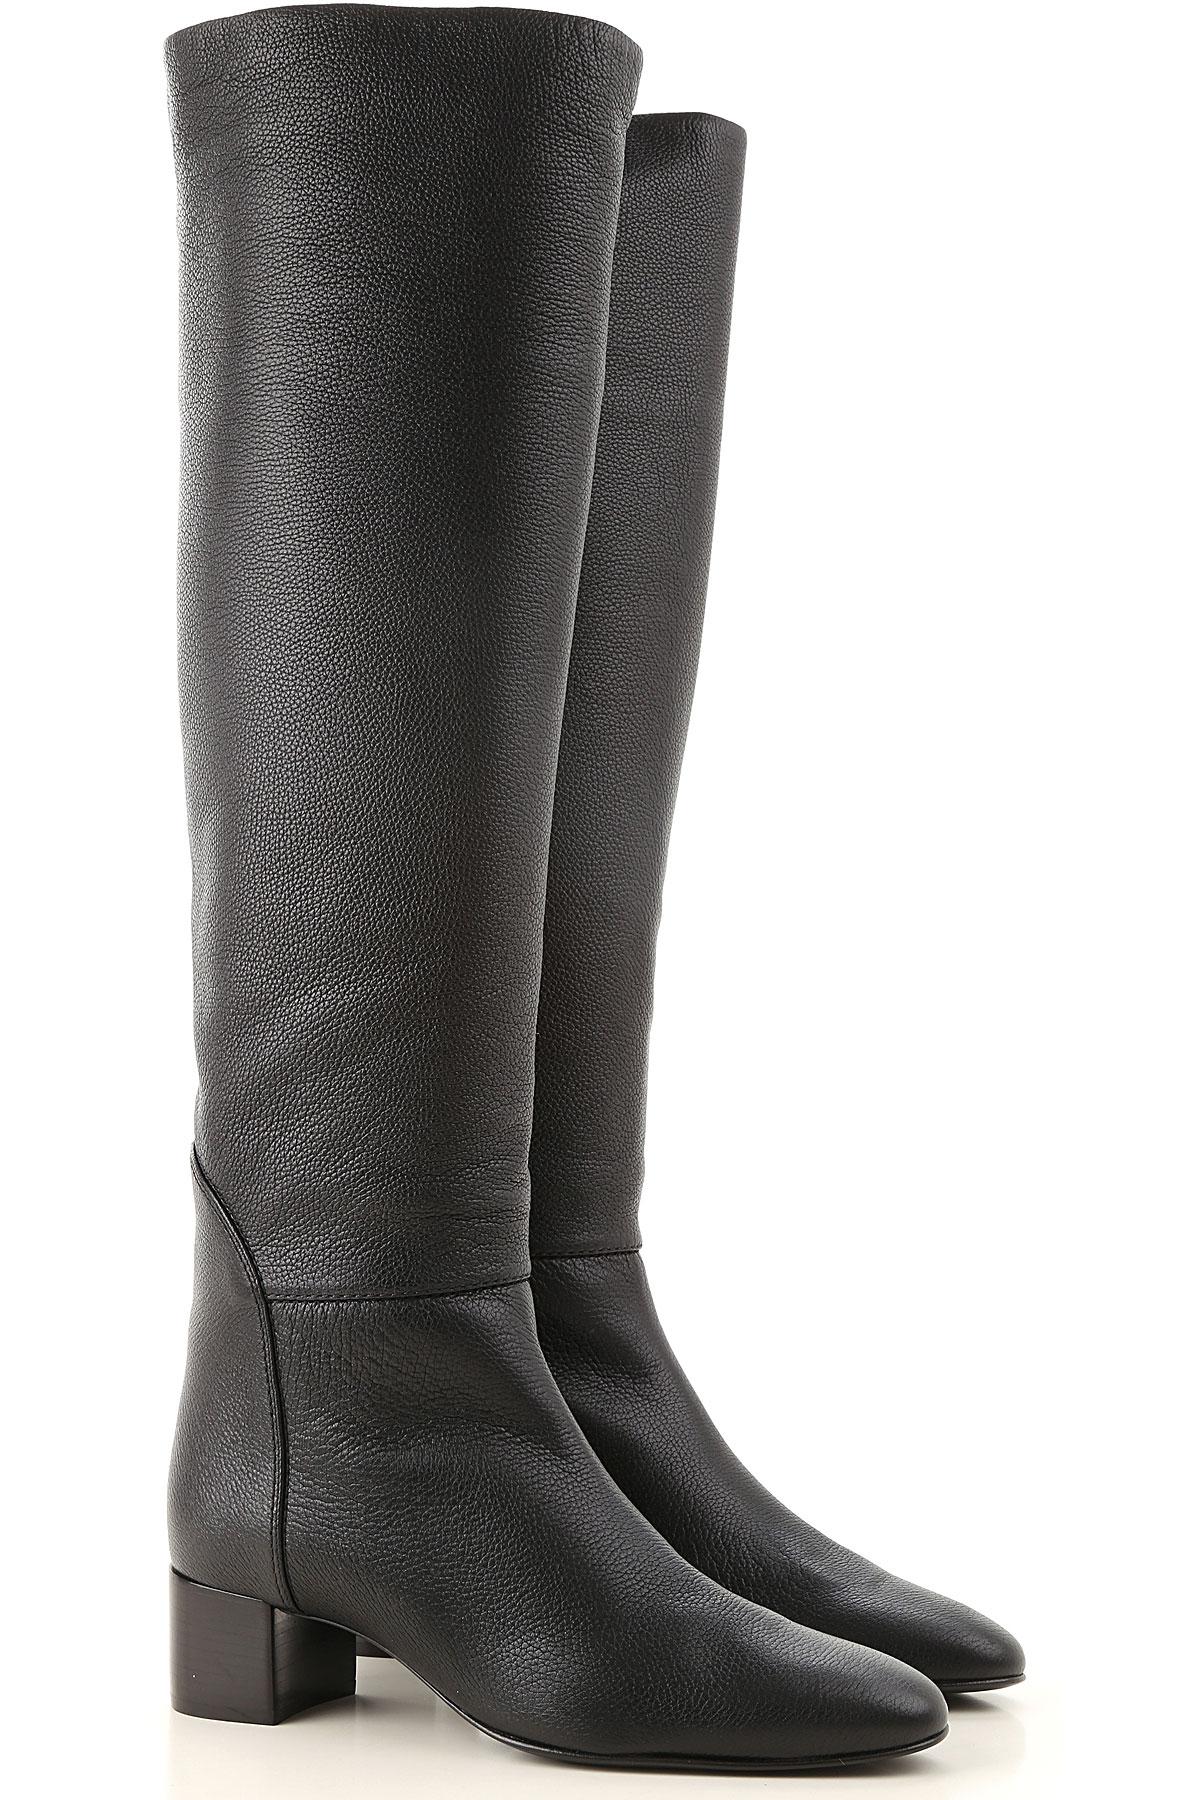 Giuseppe Zanotti Design Boots for Women, Booties On Sale, Black, 2019, 10 11 6